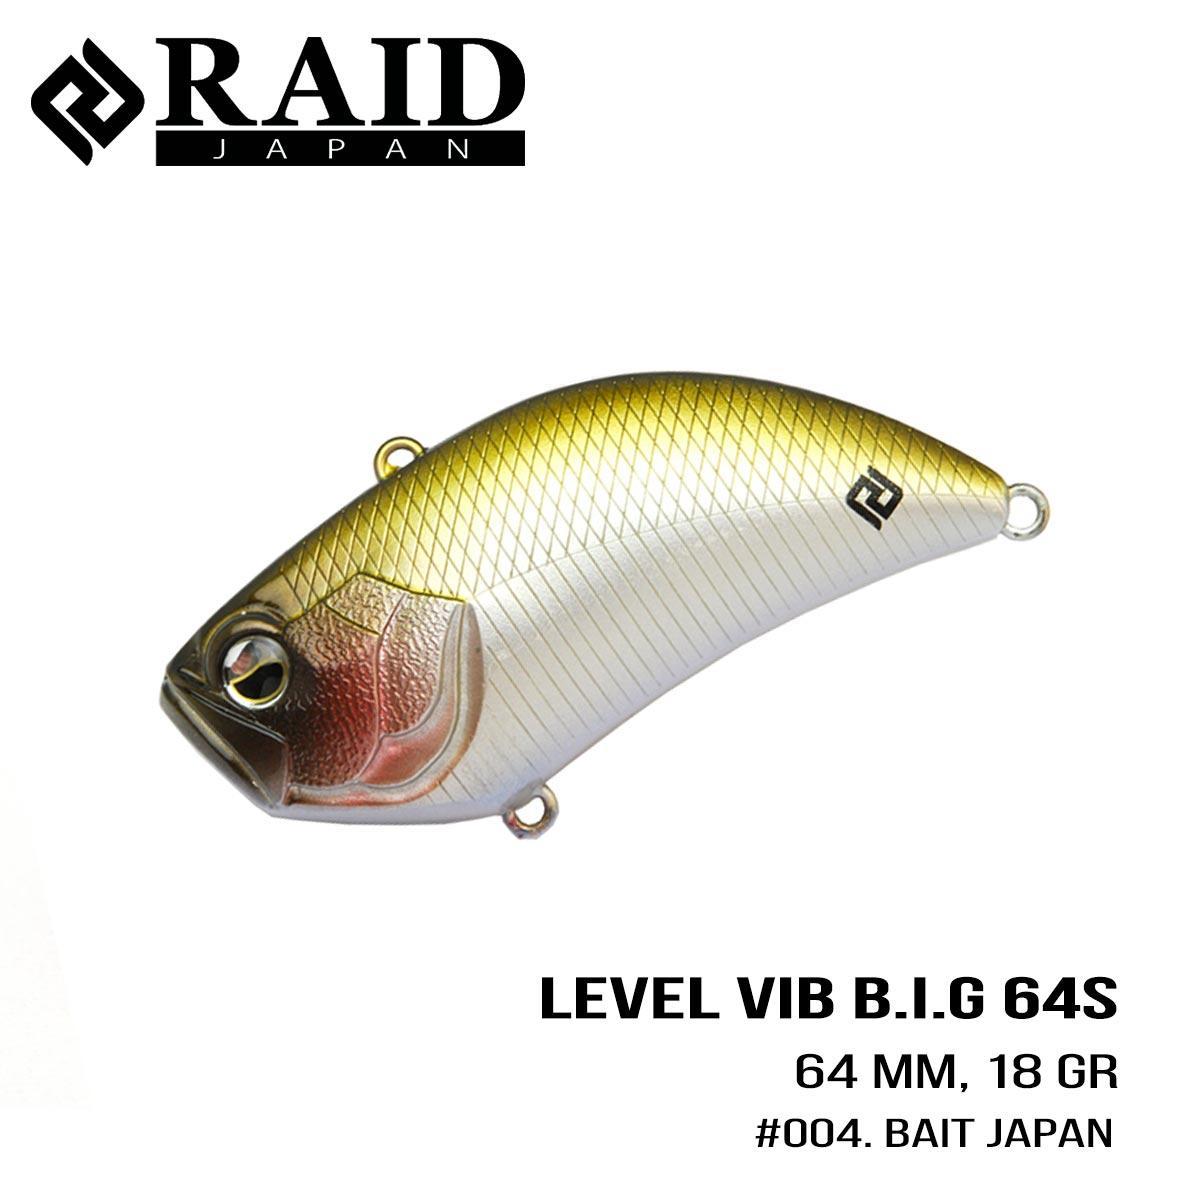 Воблер Raid Level Vib B.I.G. (64mm, 18g) (004 Bait Japan)